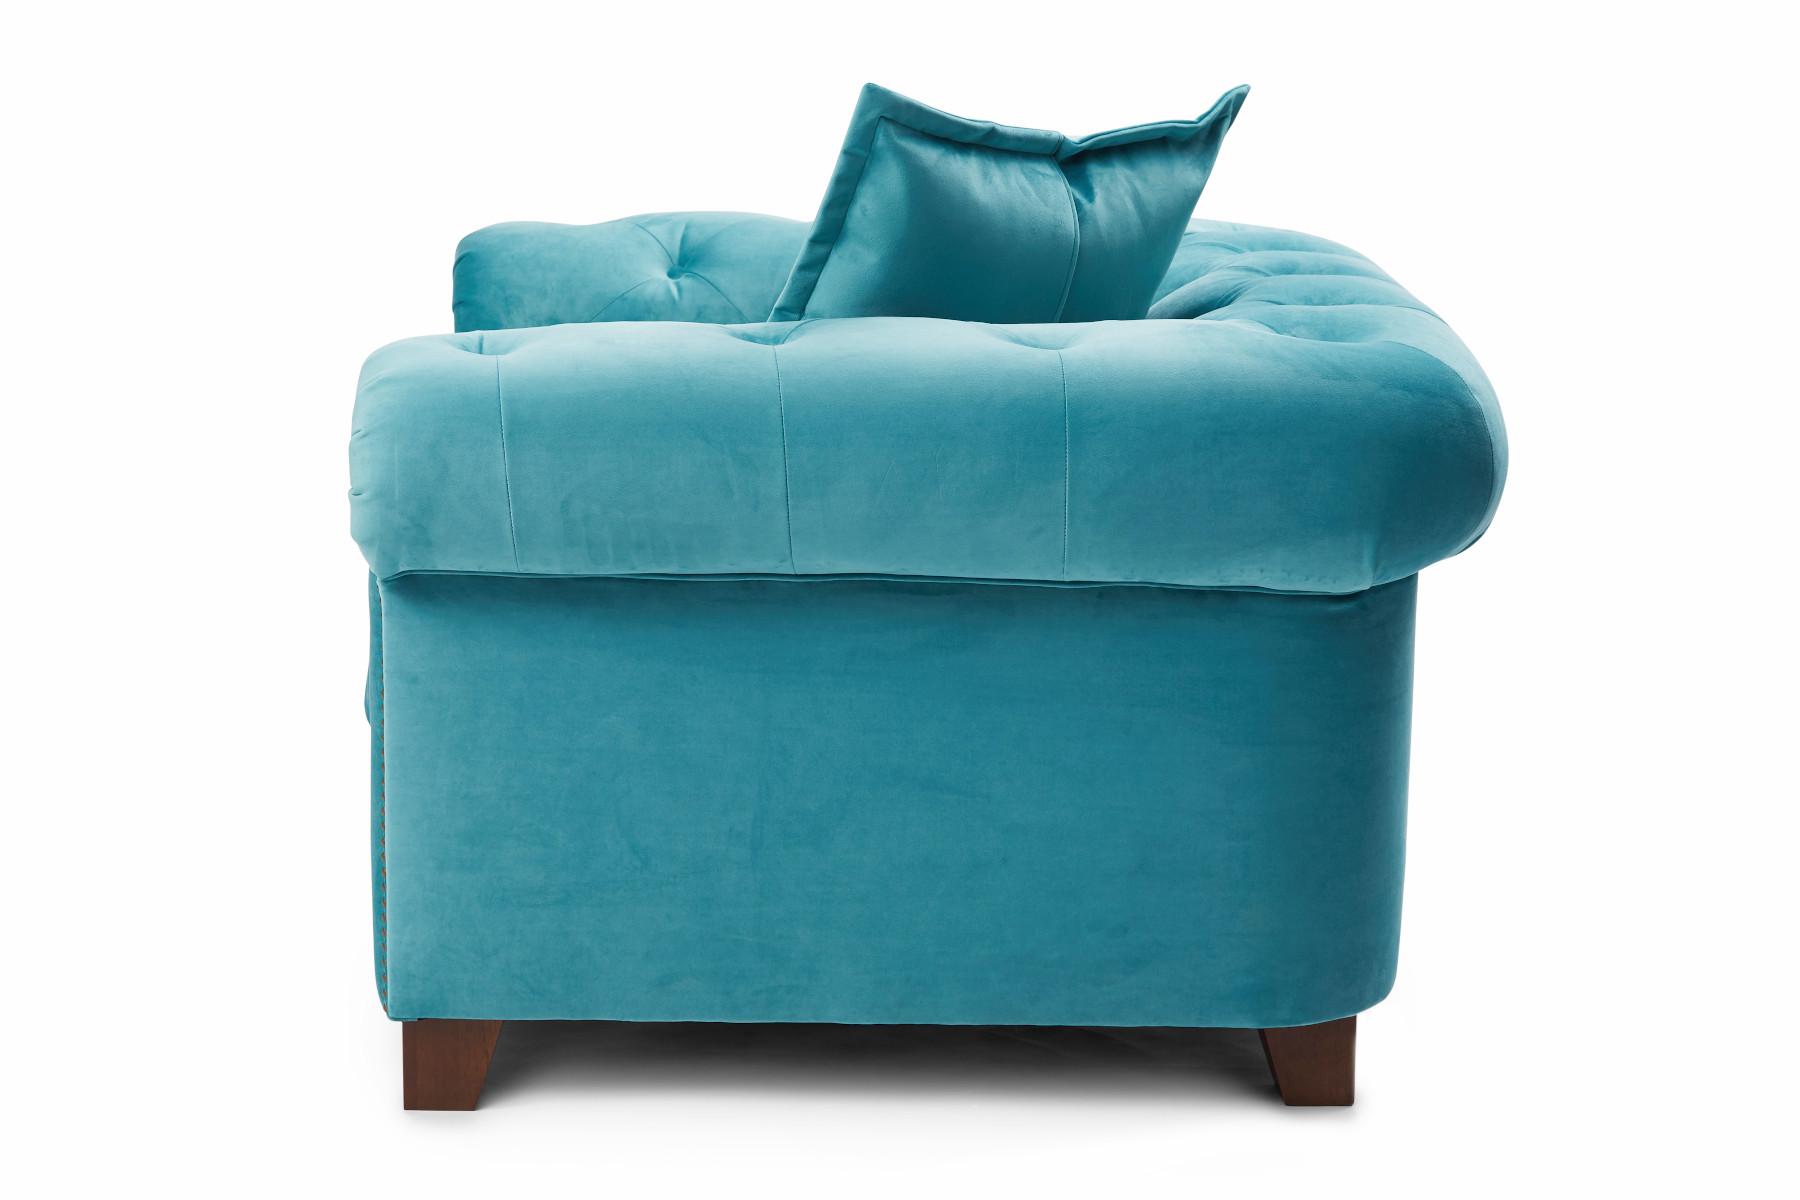 Kennedy Cuddle Chair - Teal